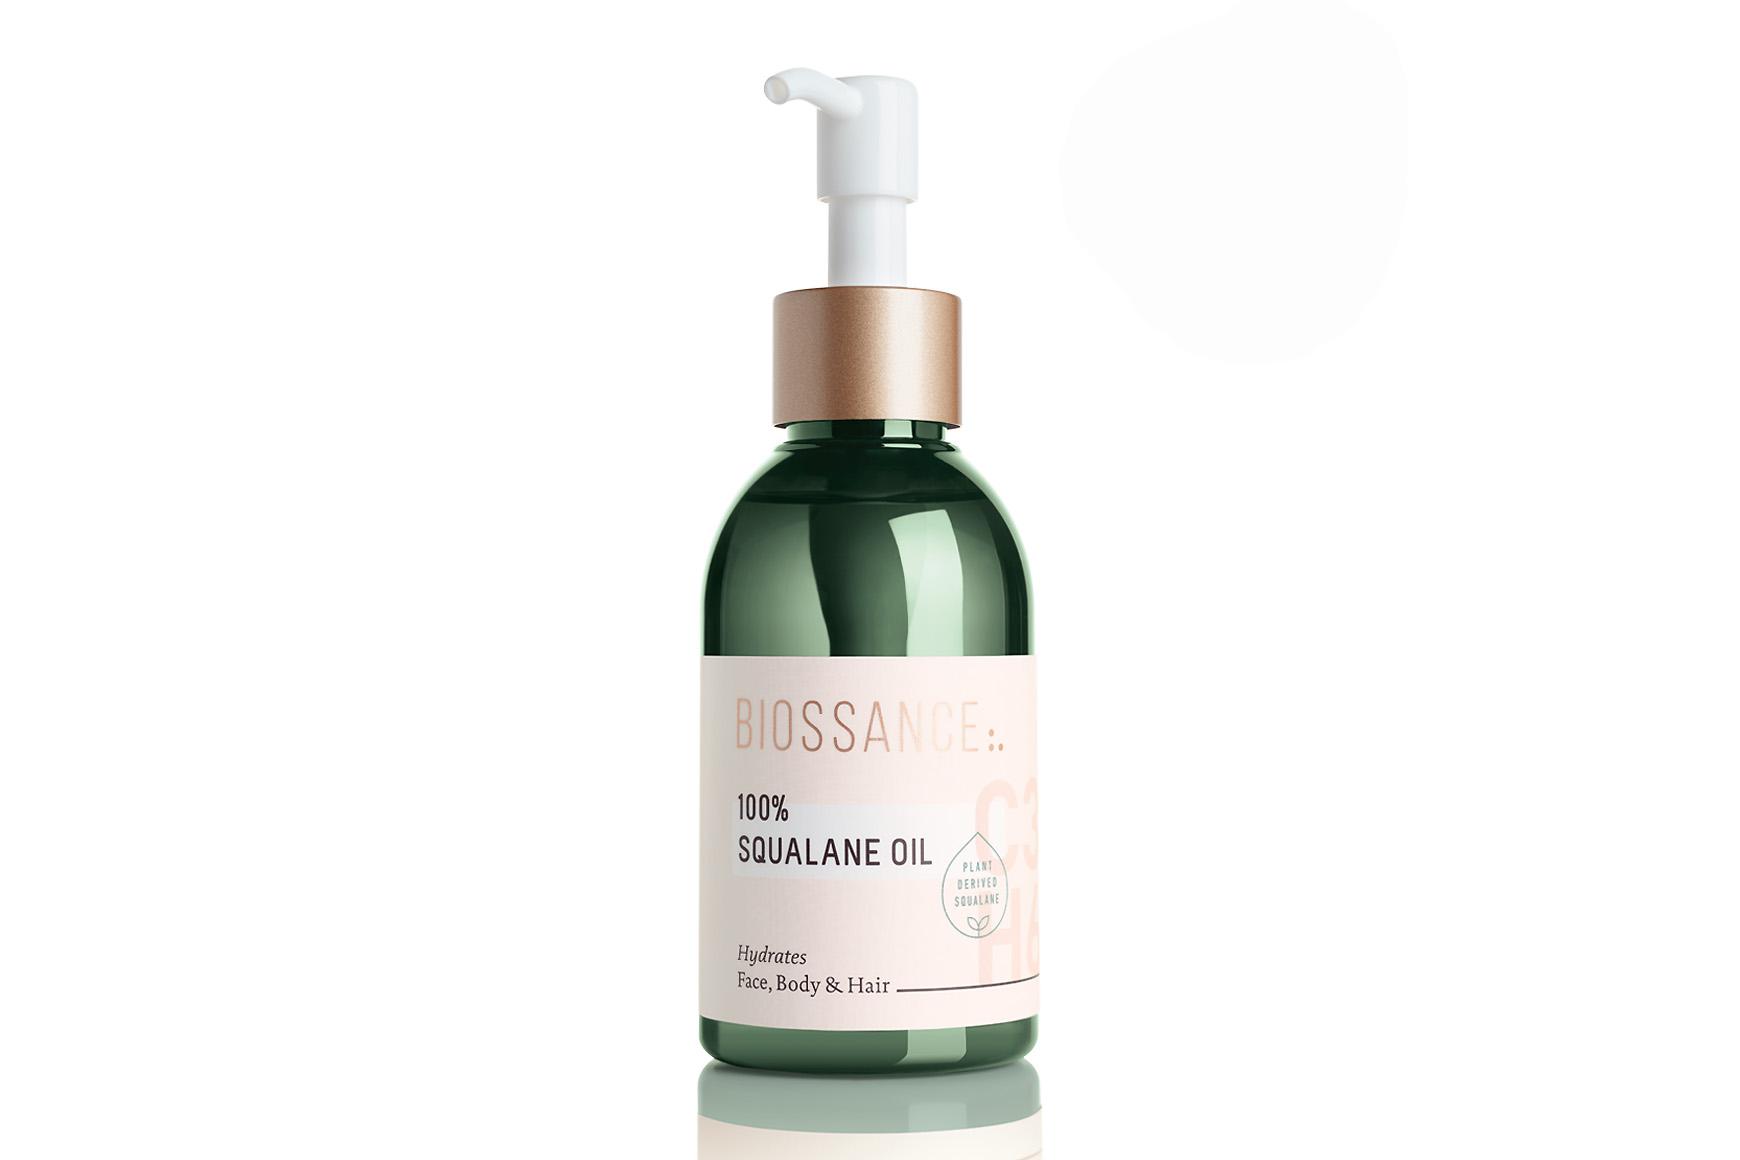 biotech-skincare-ingredients-squalane-biossance